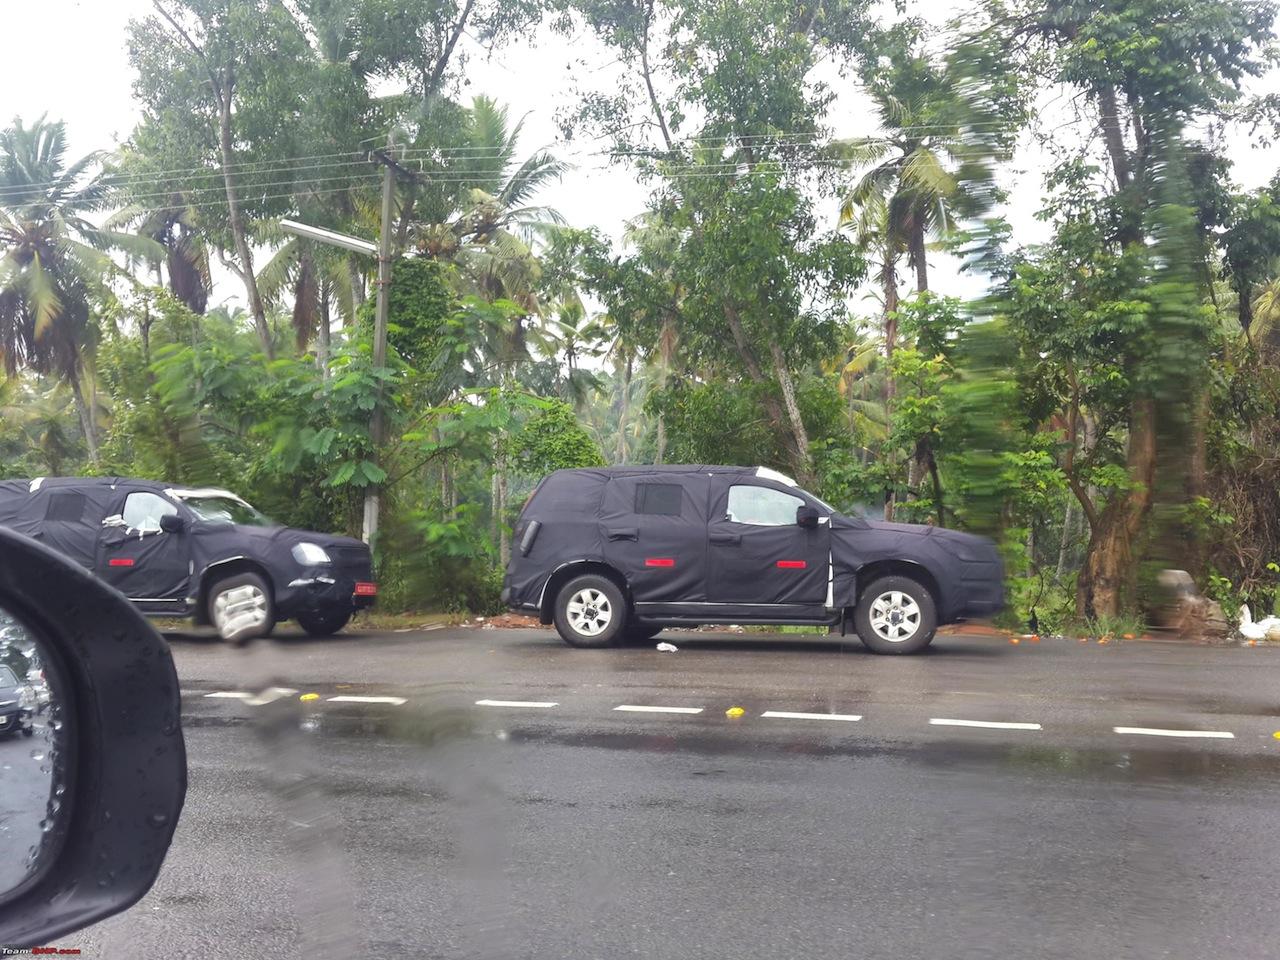 2015 Chevrolet Trailblazer side spied testing Trivandrum